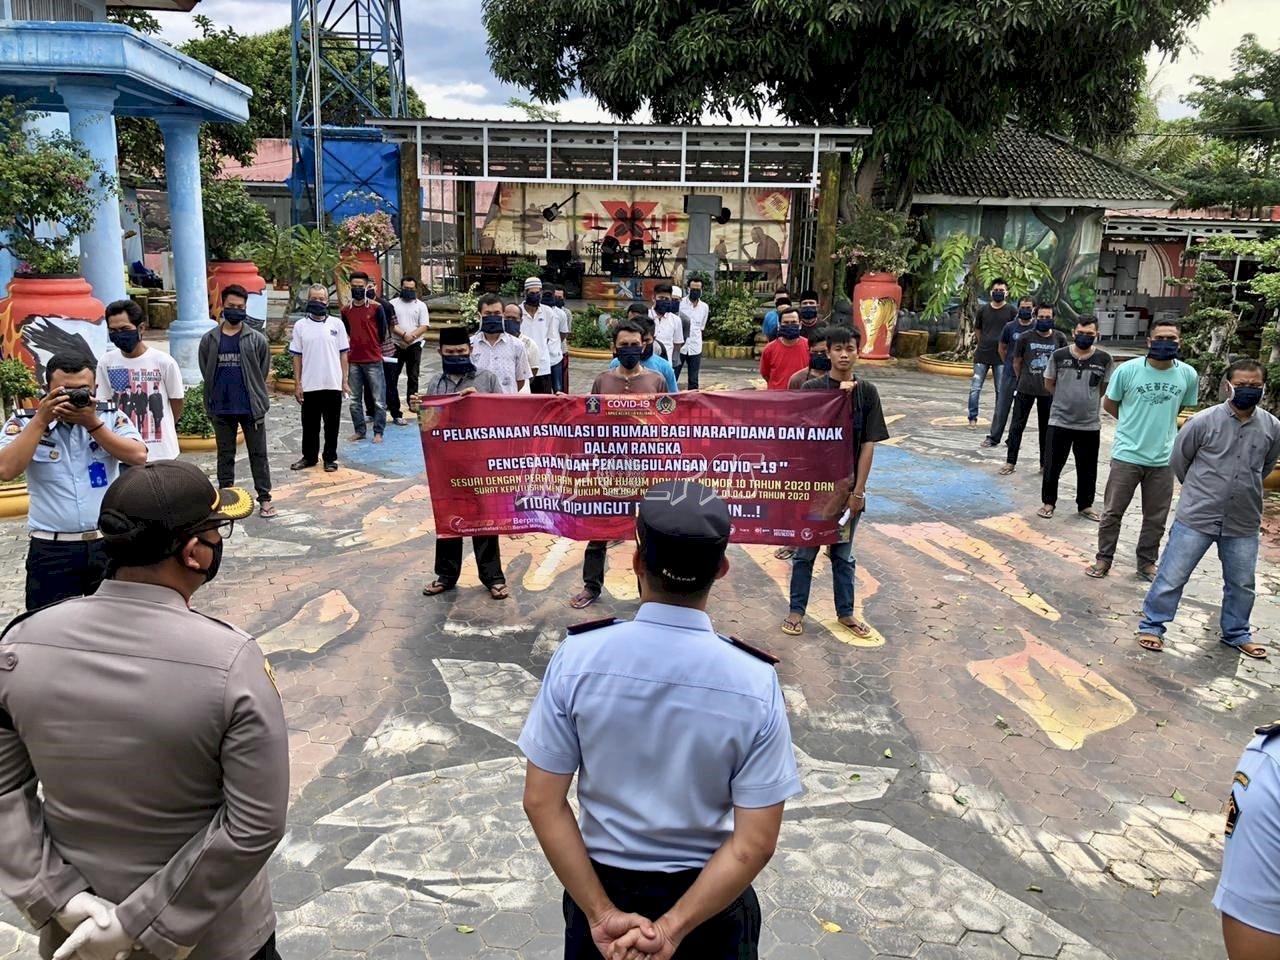 Pulangkan WBP Asimilasi, Lapas Kalianda Gandeng Polres Lampung Selatan